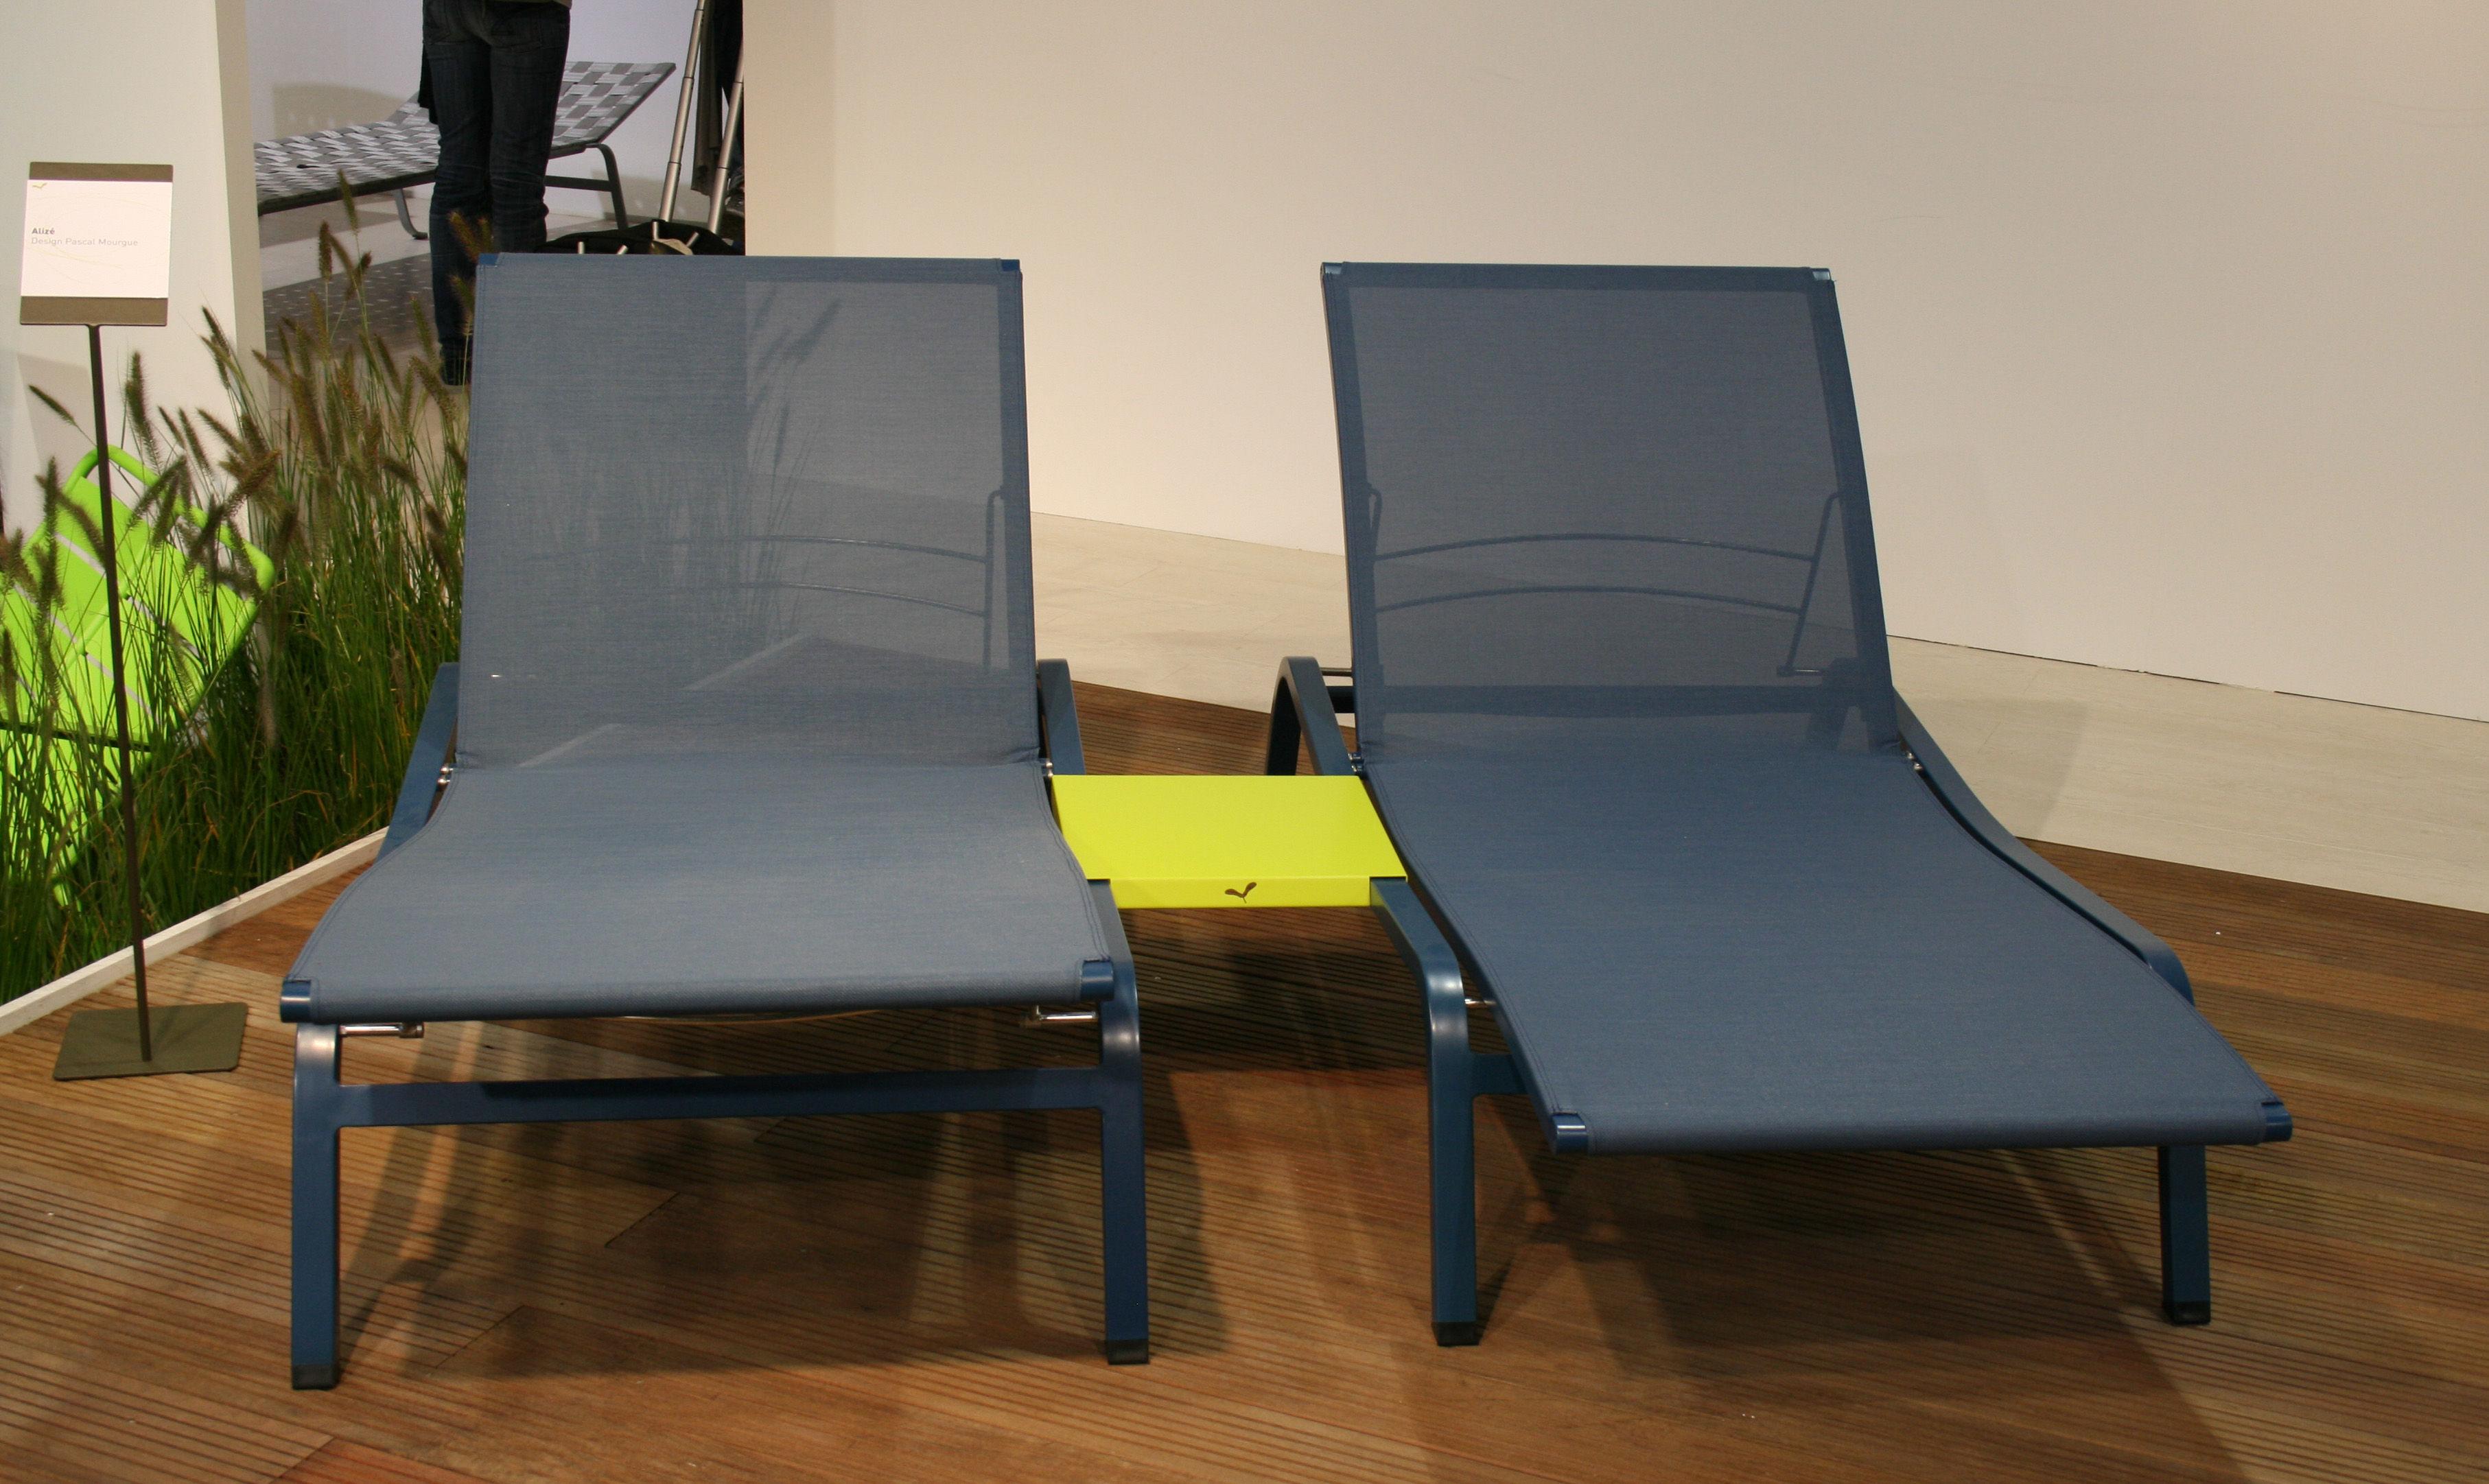 bain de soleil aliz larg 80 cm 3 positions muscade. Black Bedroom Furniture Sets. Home Design Ideas